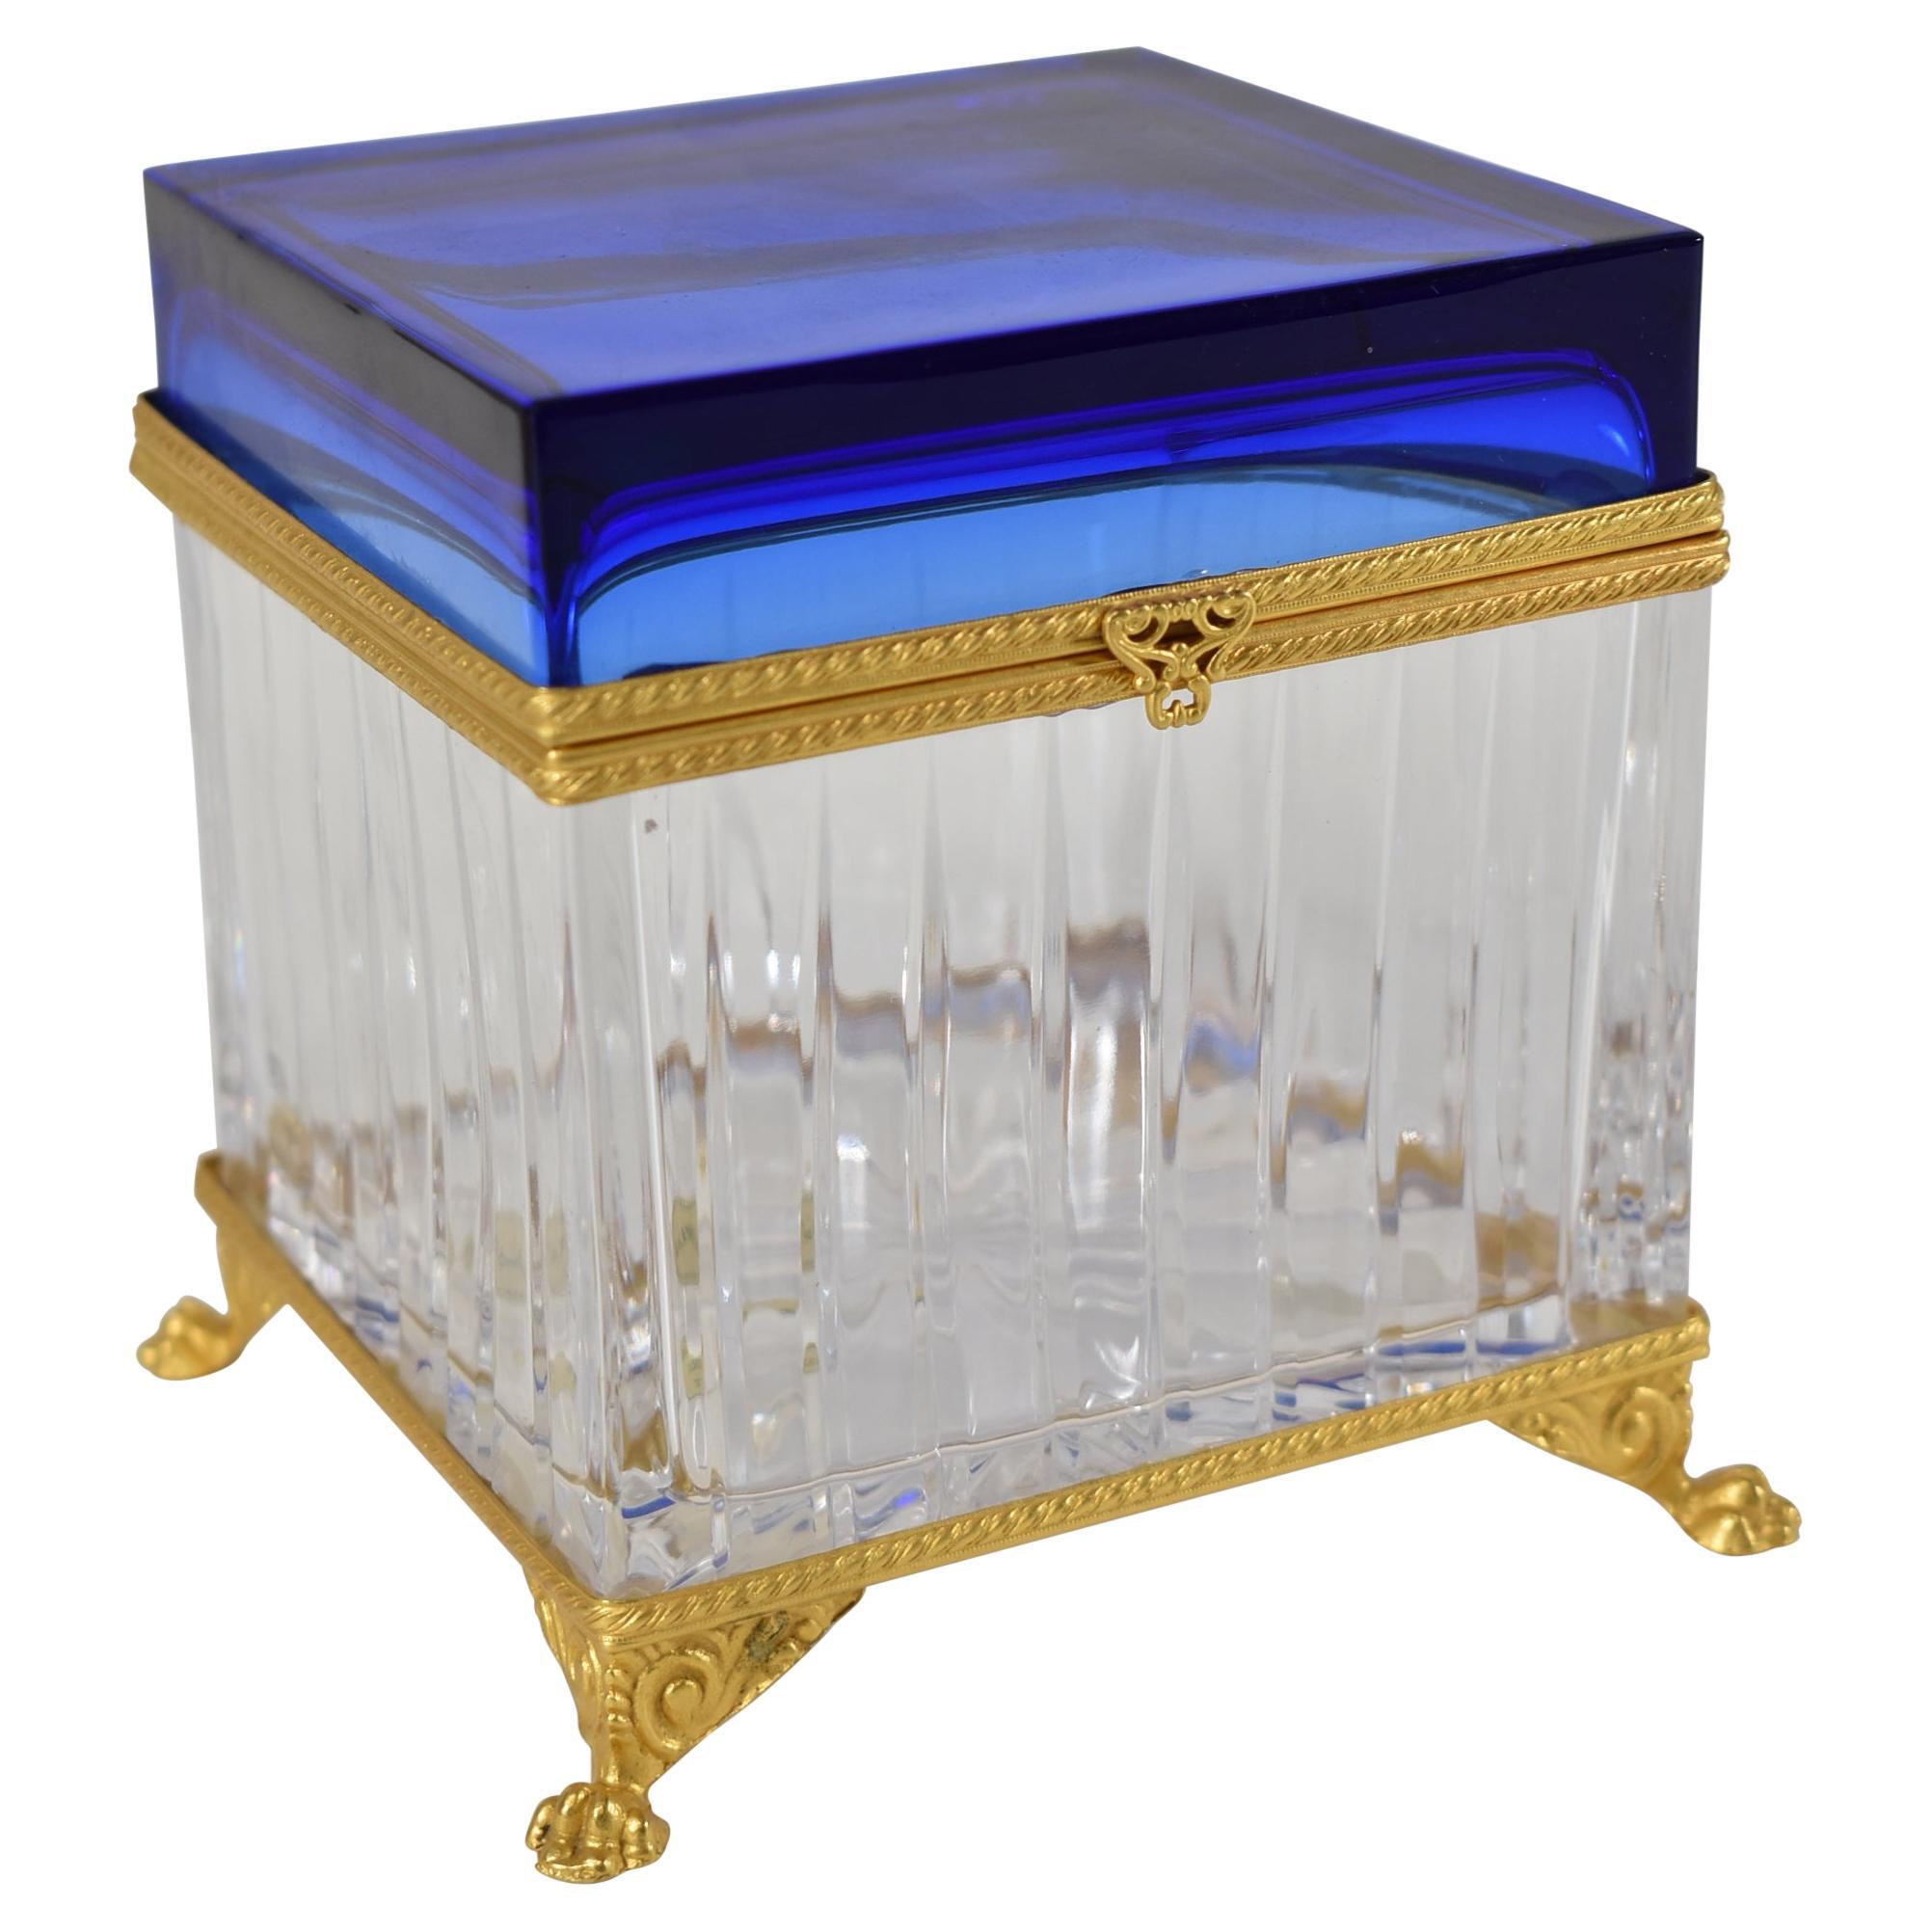 Pitti Collection By Baldi Italian Glass Box 24k Gold Dore Cobalt Blue